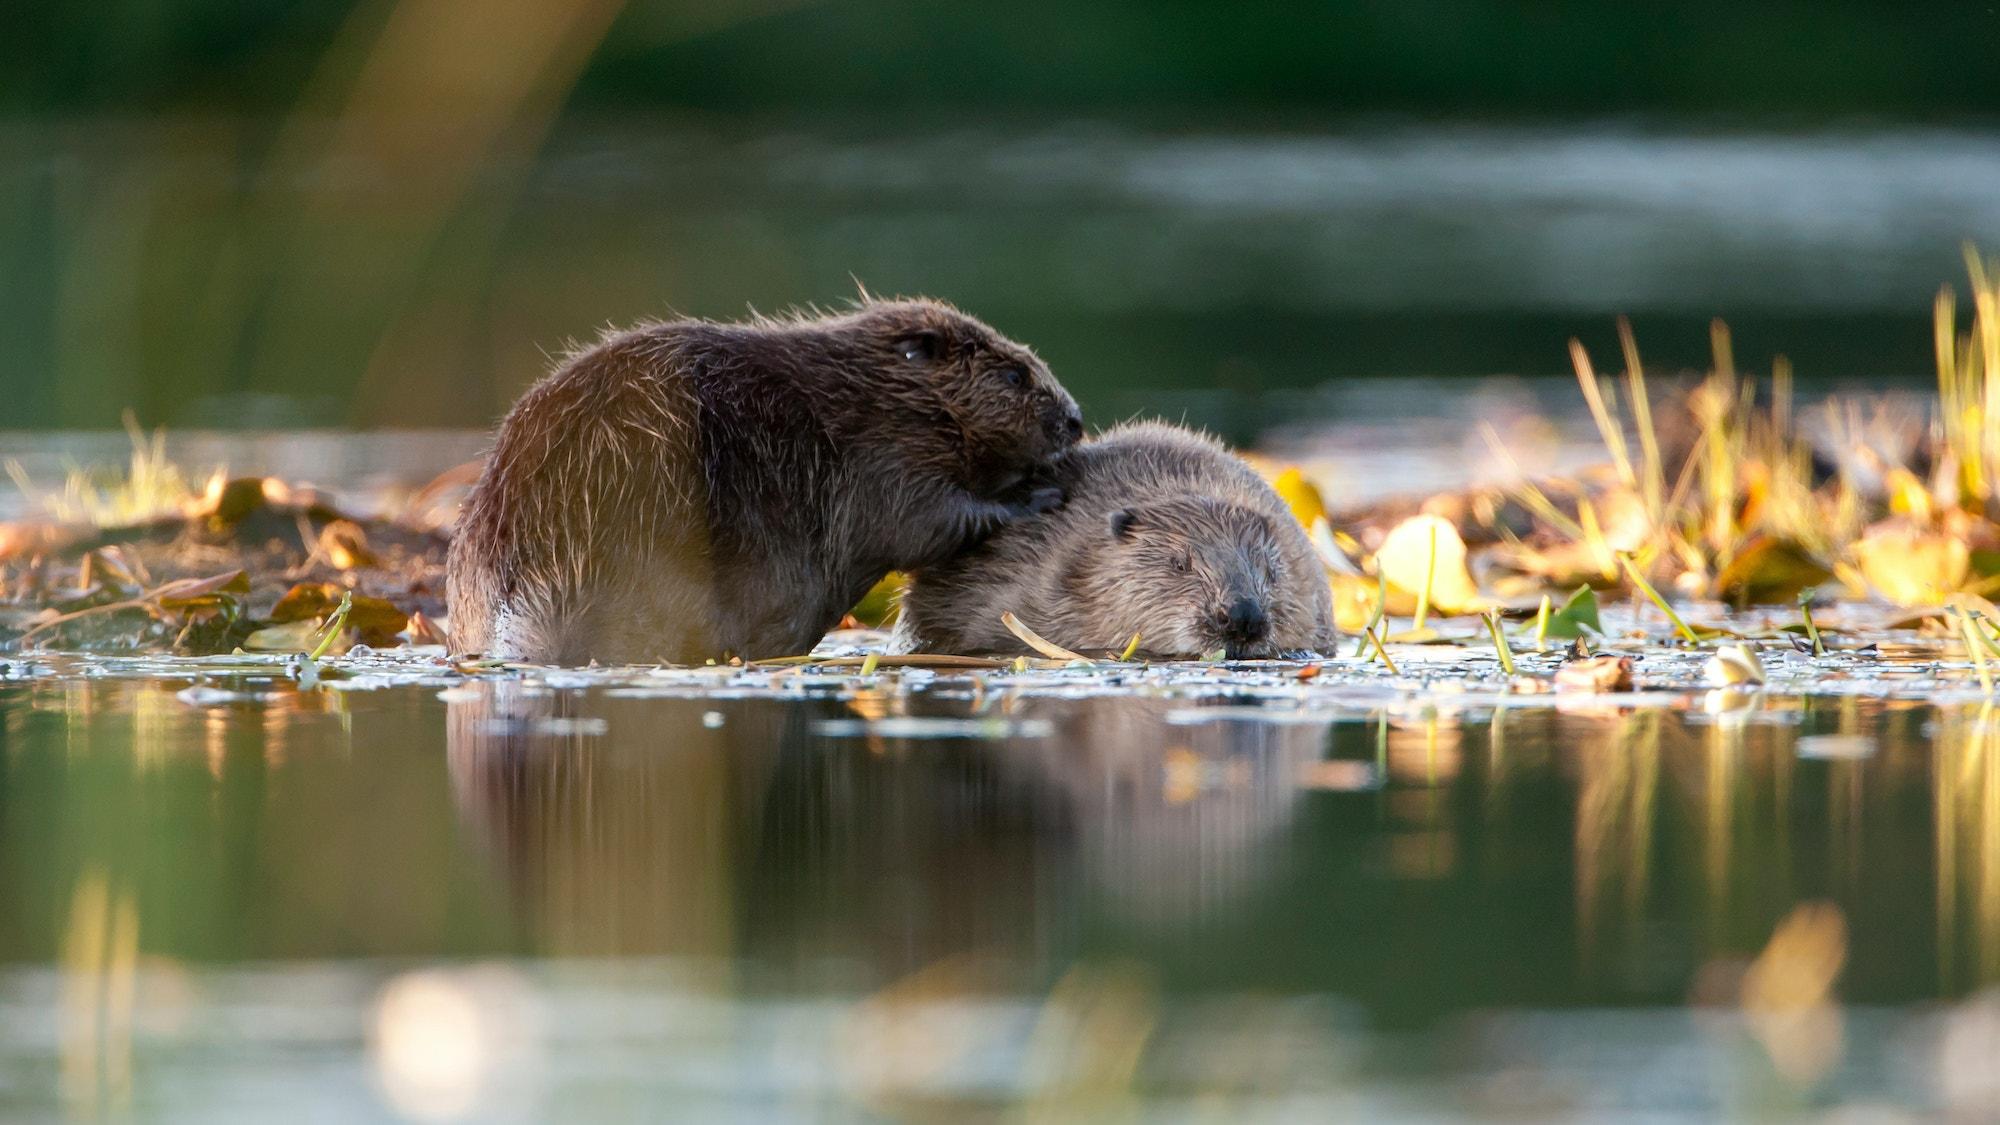 0048pprice beaverbeaver 2892 credit scotlandbigpicture com